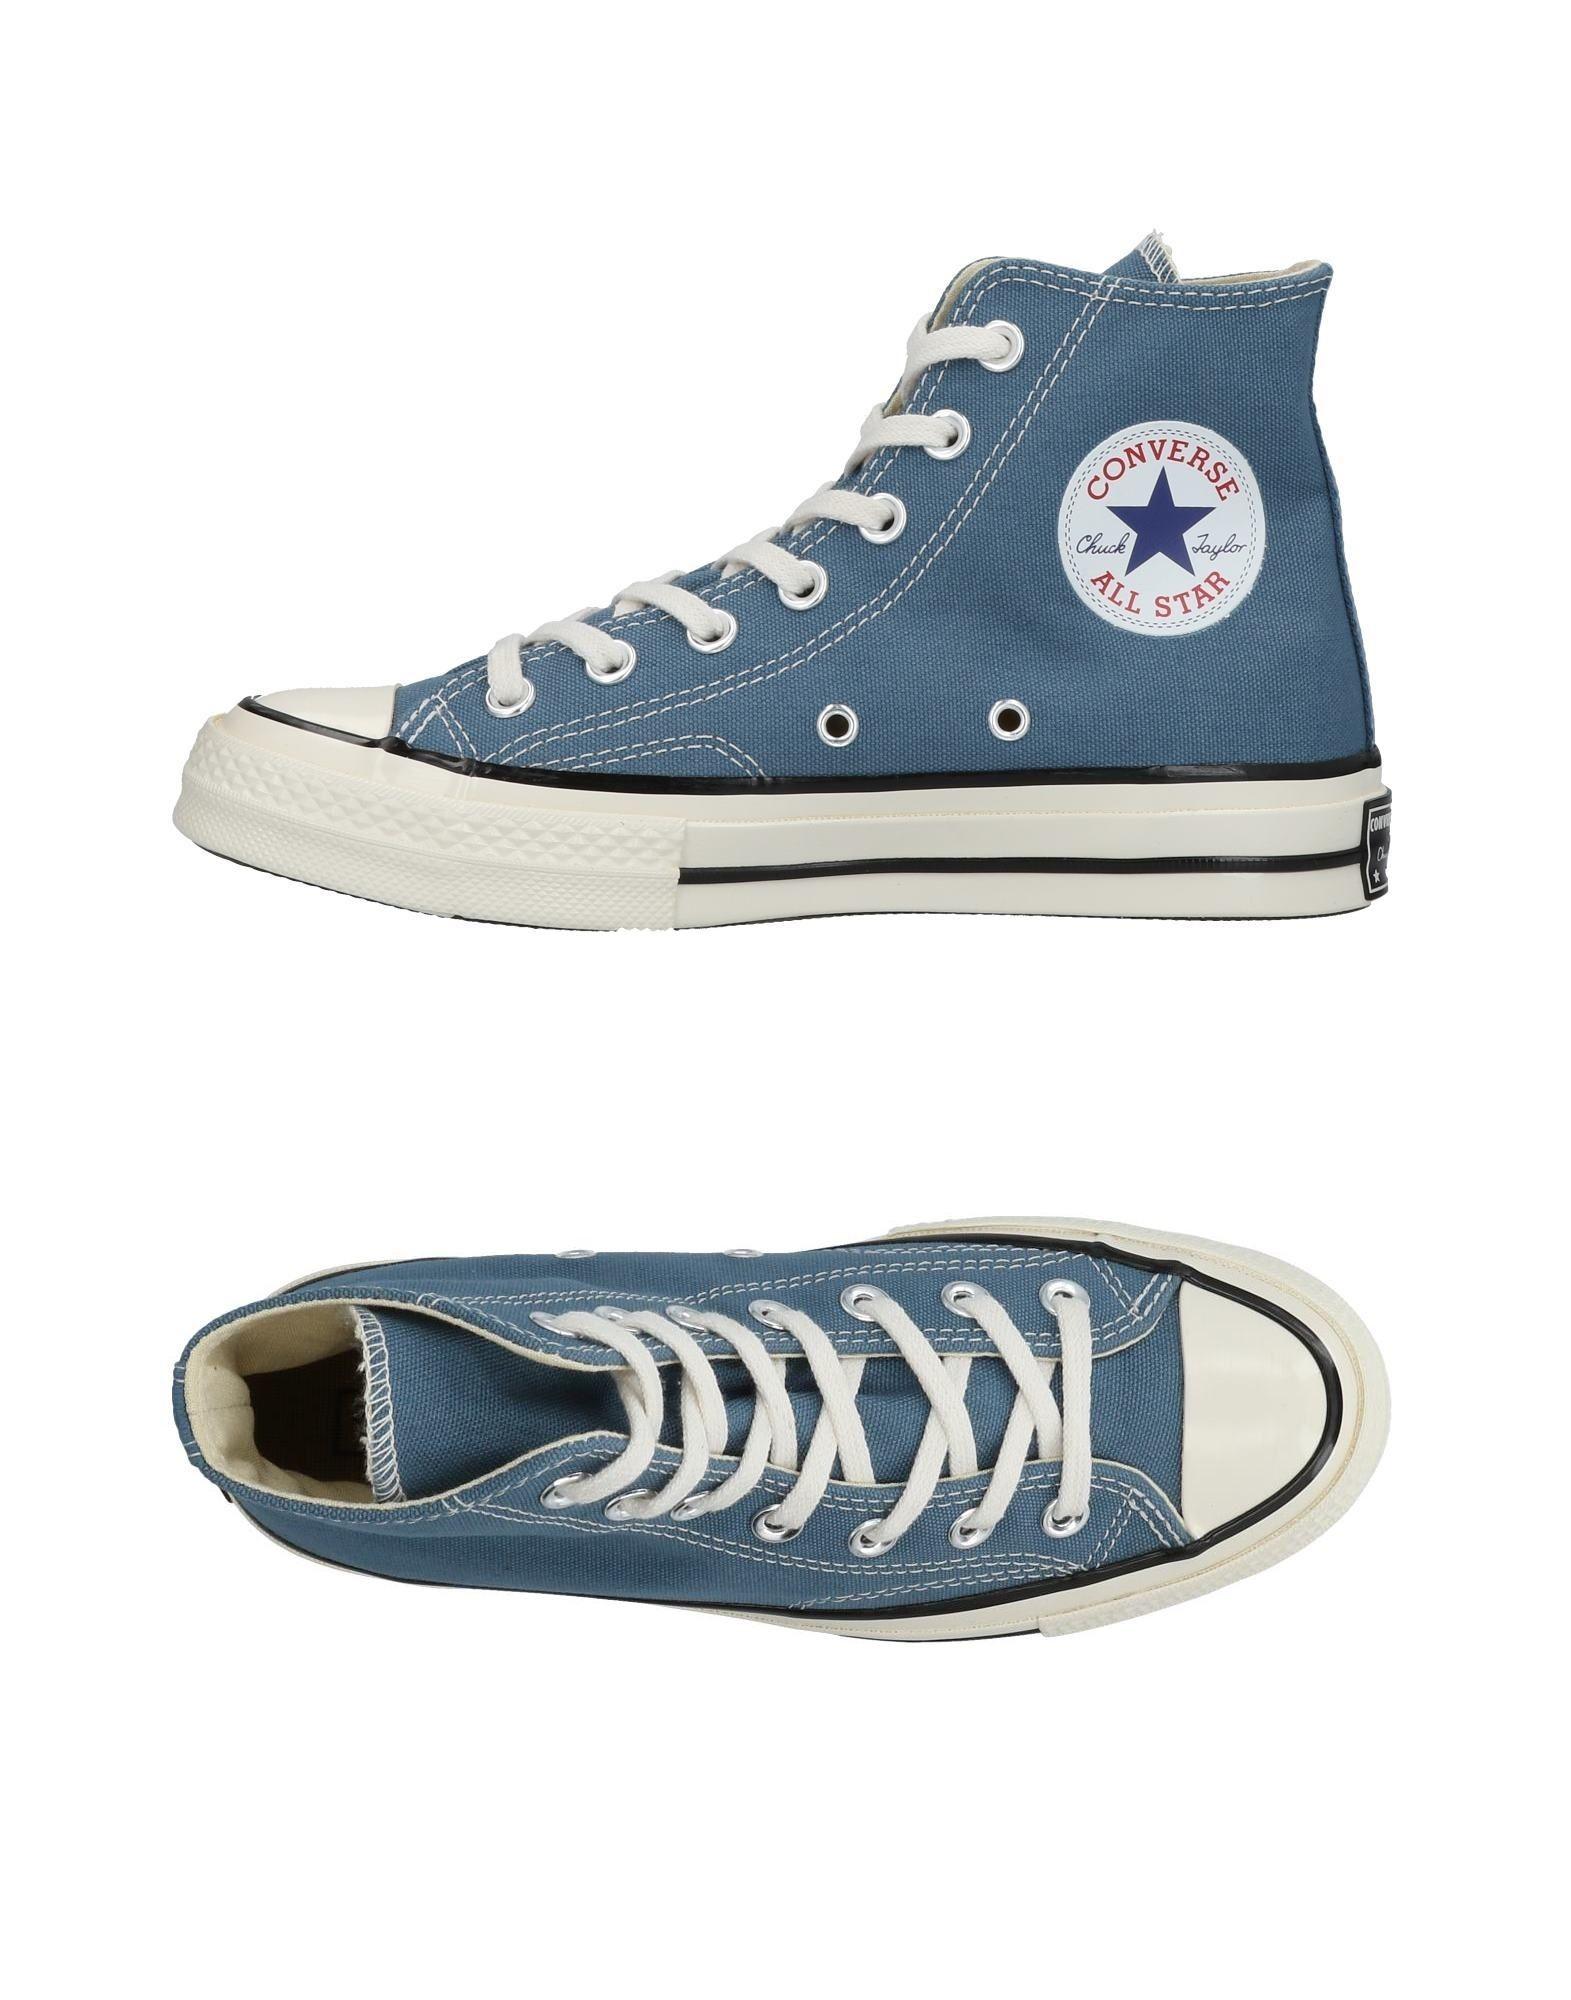 CONVERSE ALL STAR CHUCK TAYLOR II Высокие кеды и кроссовки кеды converse кеды chuck taylor all star ii